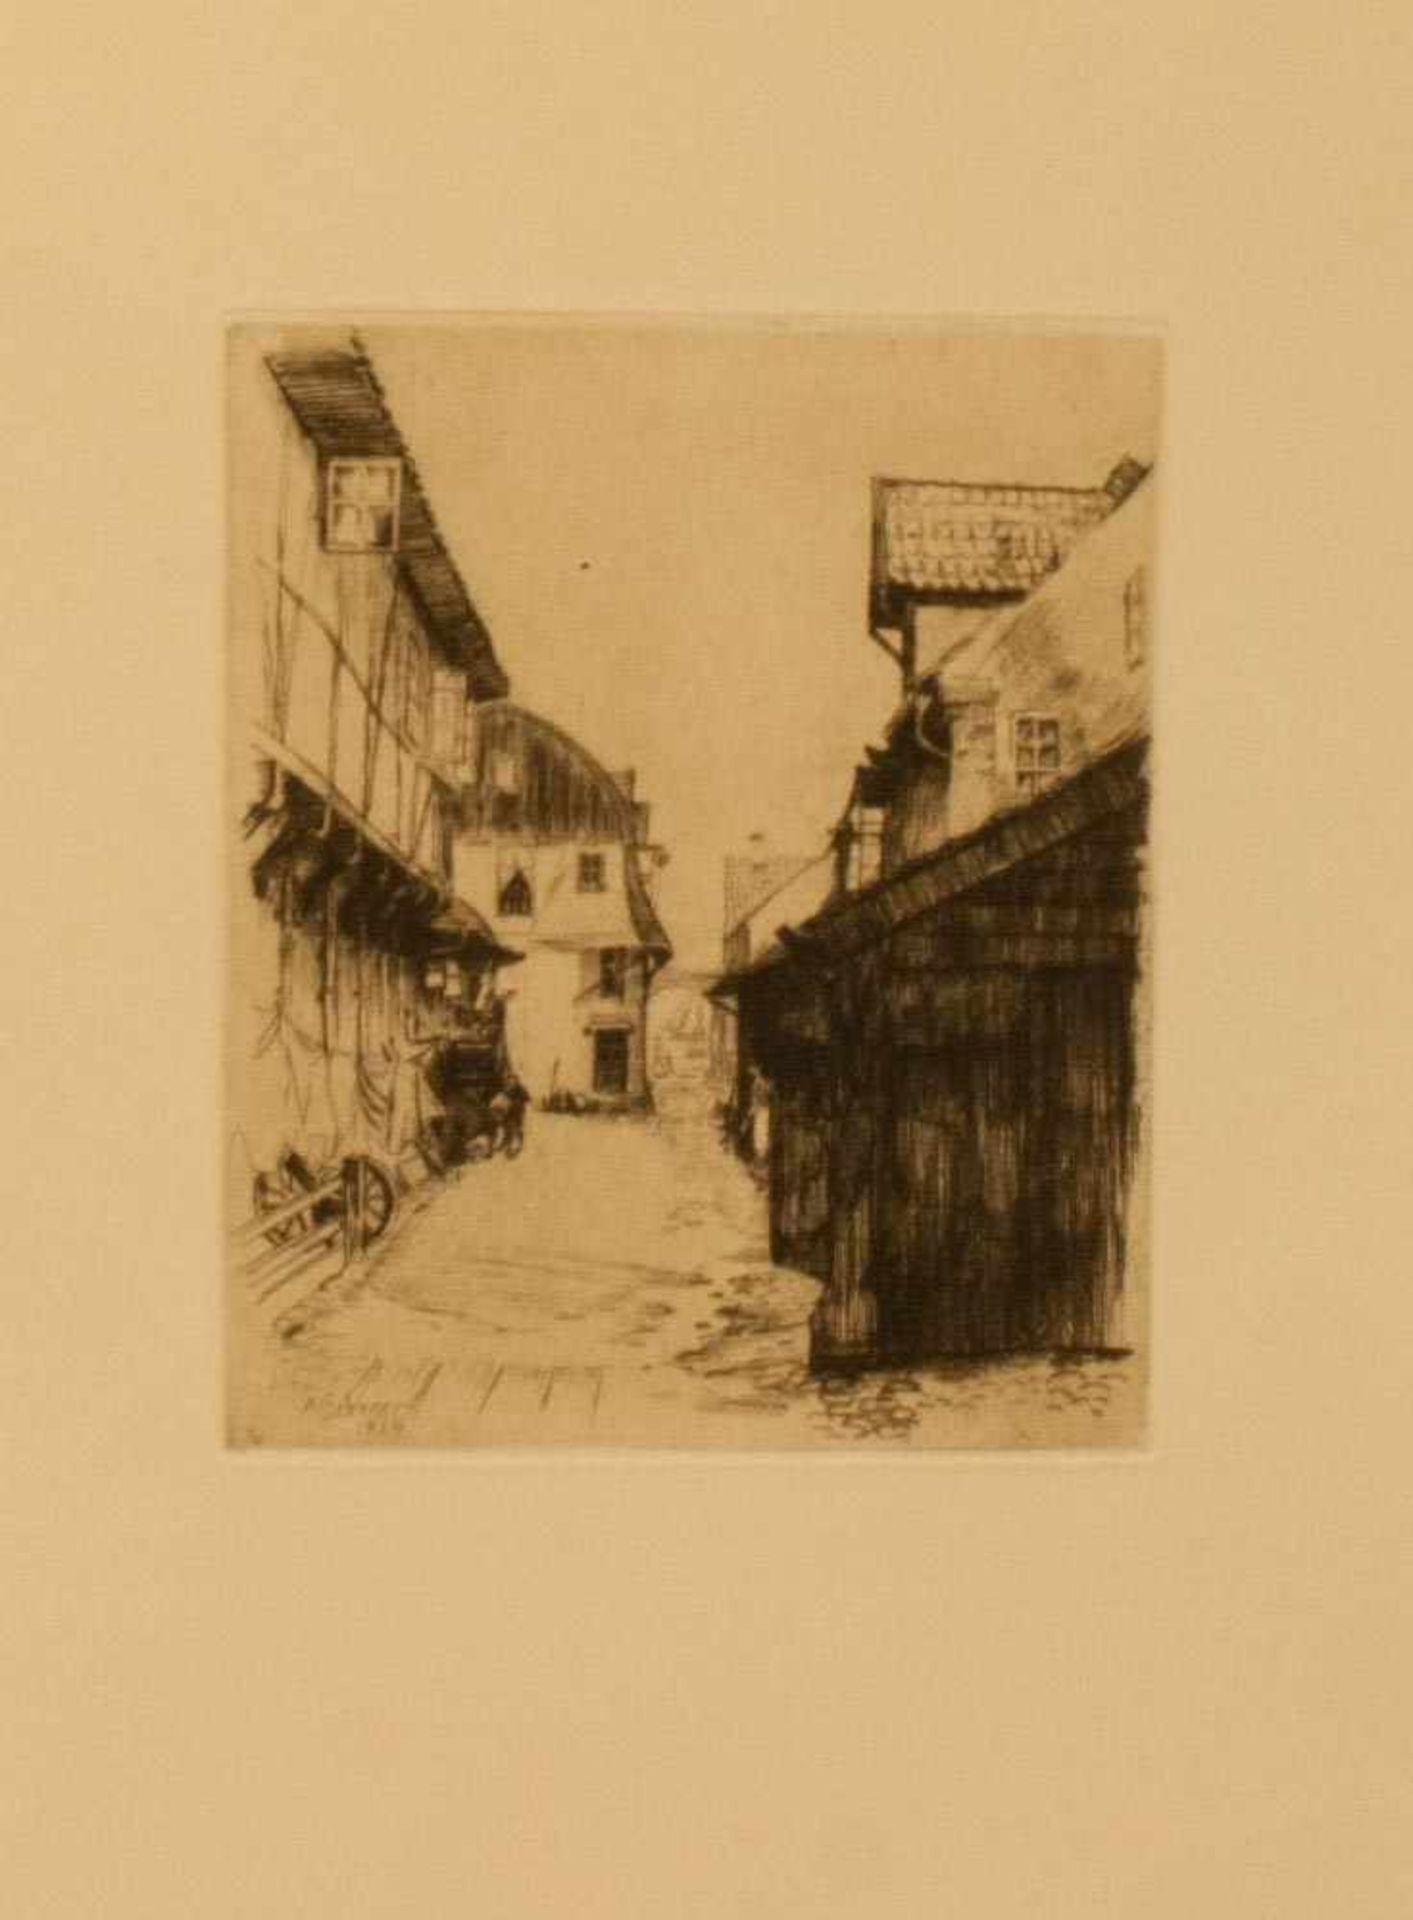 Alexander Eckener (Flensburg 1870 - 1944 Abtsgmünd, deutscher Maler u. Grafiker, Std. a.d. AK